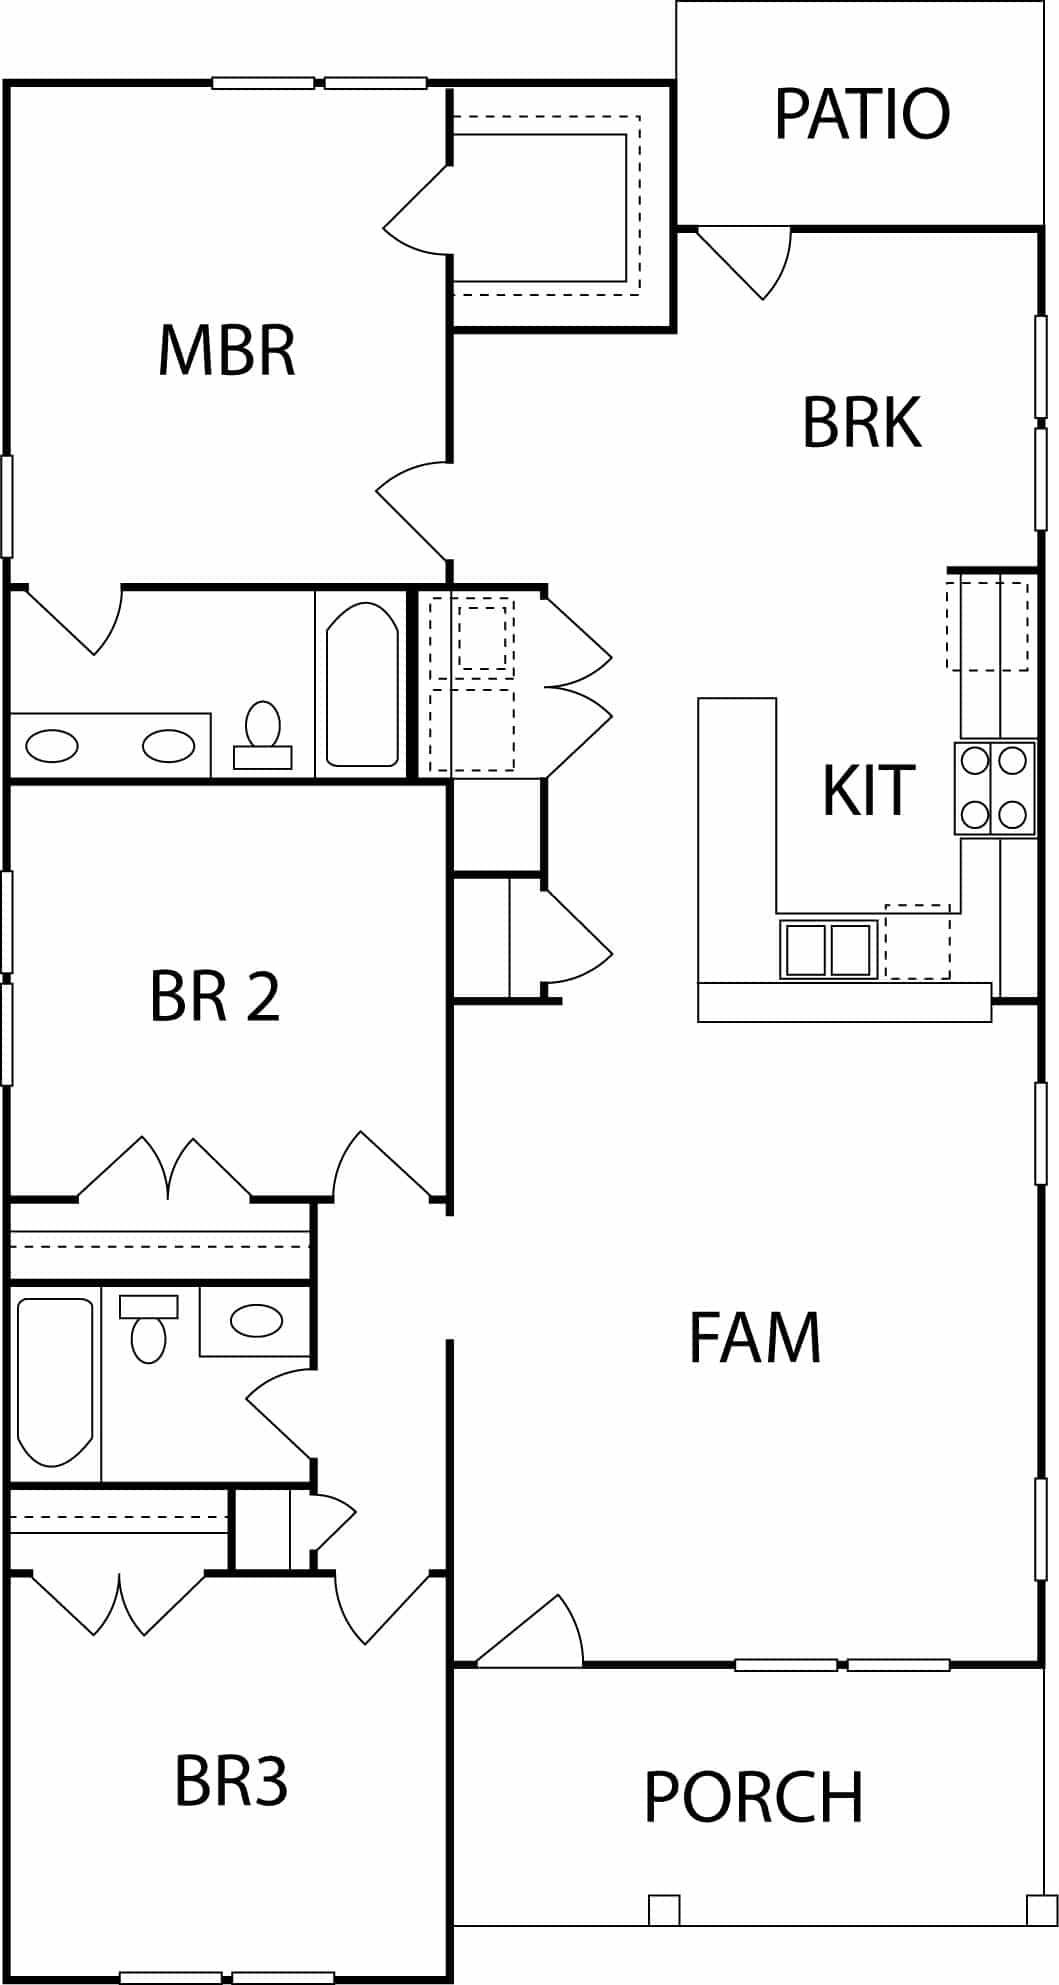 100 Biltmore Floor Plan Baby Nursery Blueprints For  : 2016 30 30 SWITCH PIKE FP 1 from jojogor.com size 1059 x 1985 jpeg 56kB